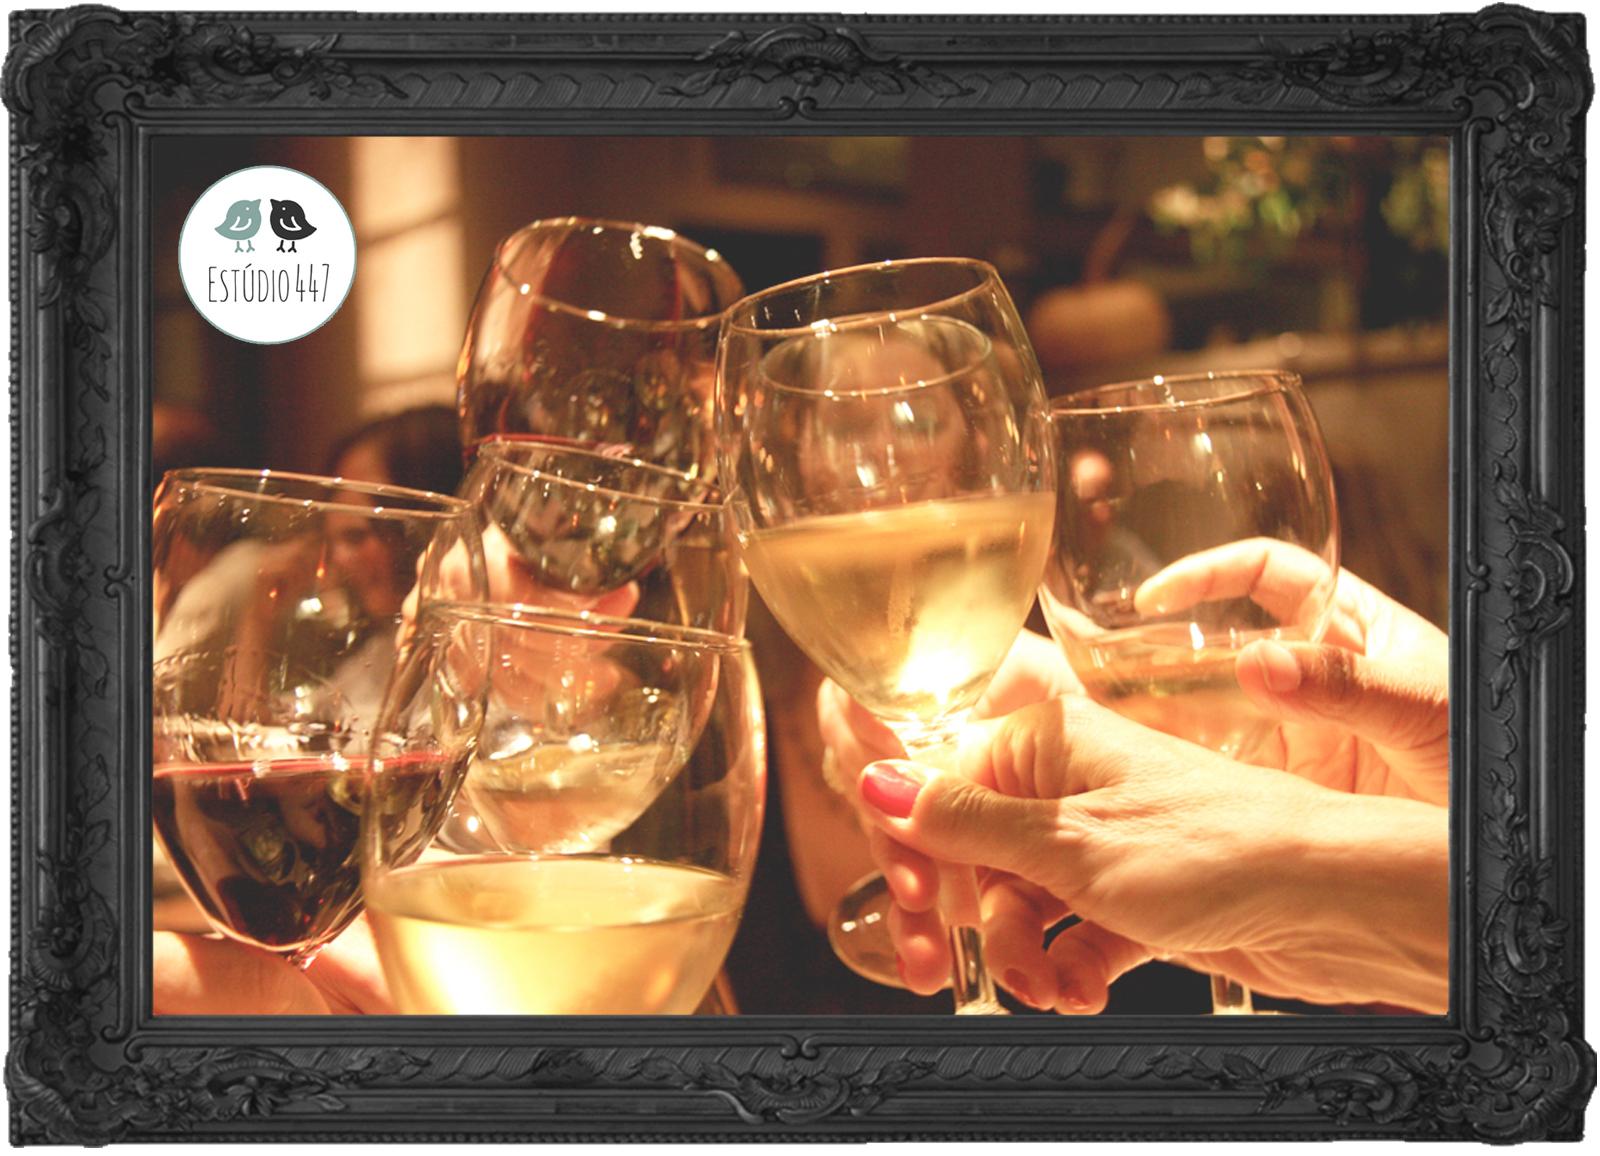 Estúdio447 Coworking Moema & English Club - Workshops em inglês - vinho